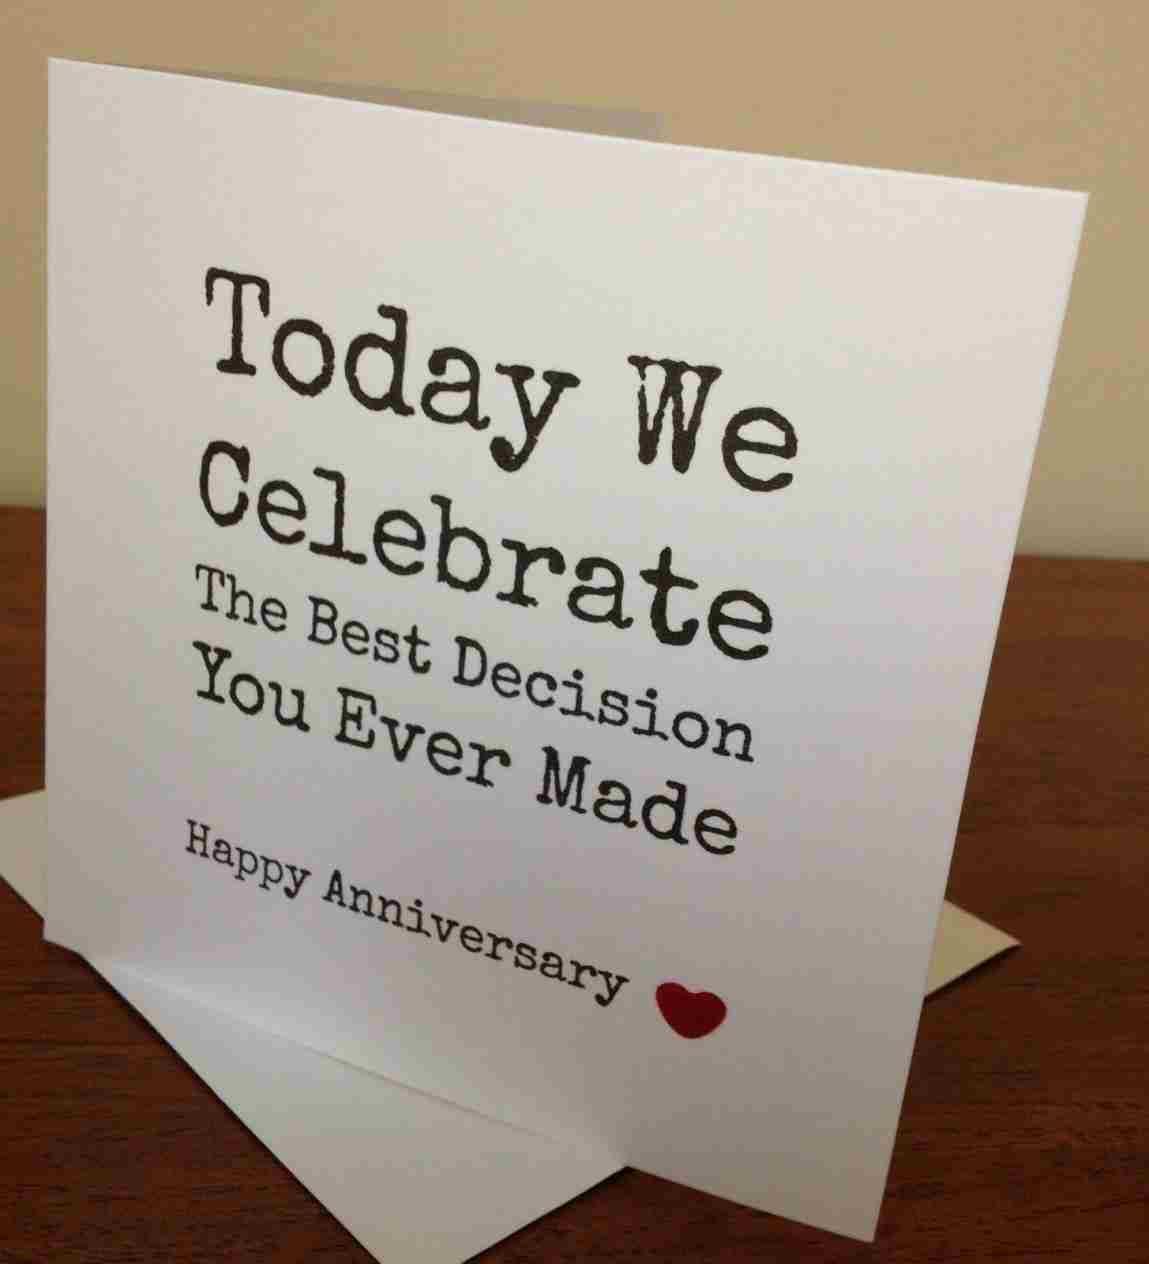 23Rd Wedding Anniversary Gift Ideas Husband  23rd Anniversary Gift For Husband Gift Ftempo